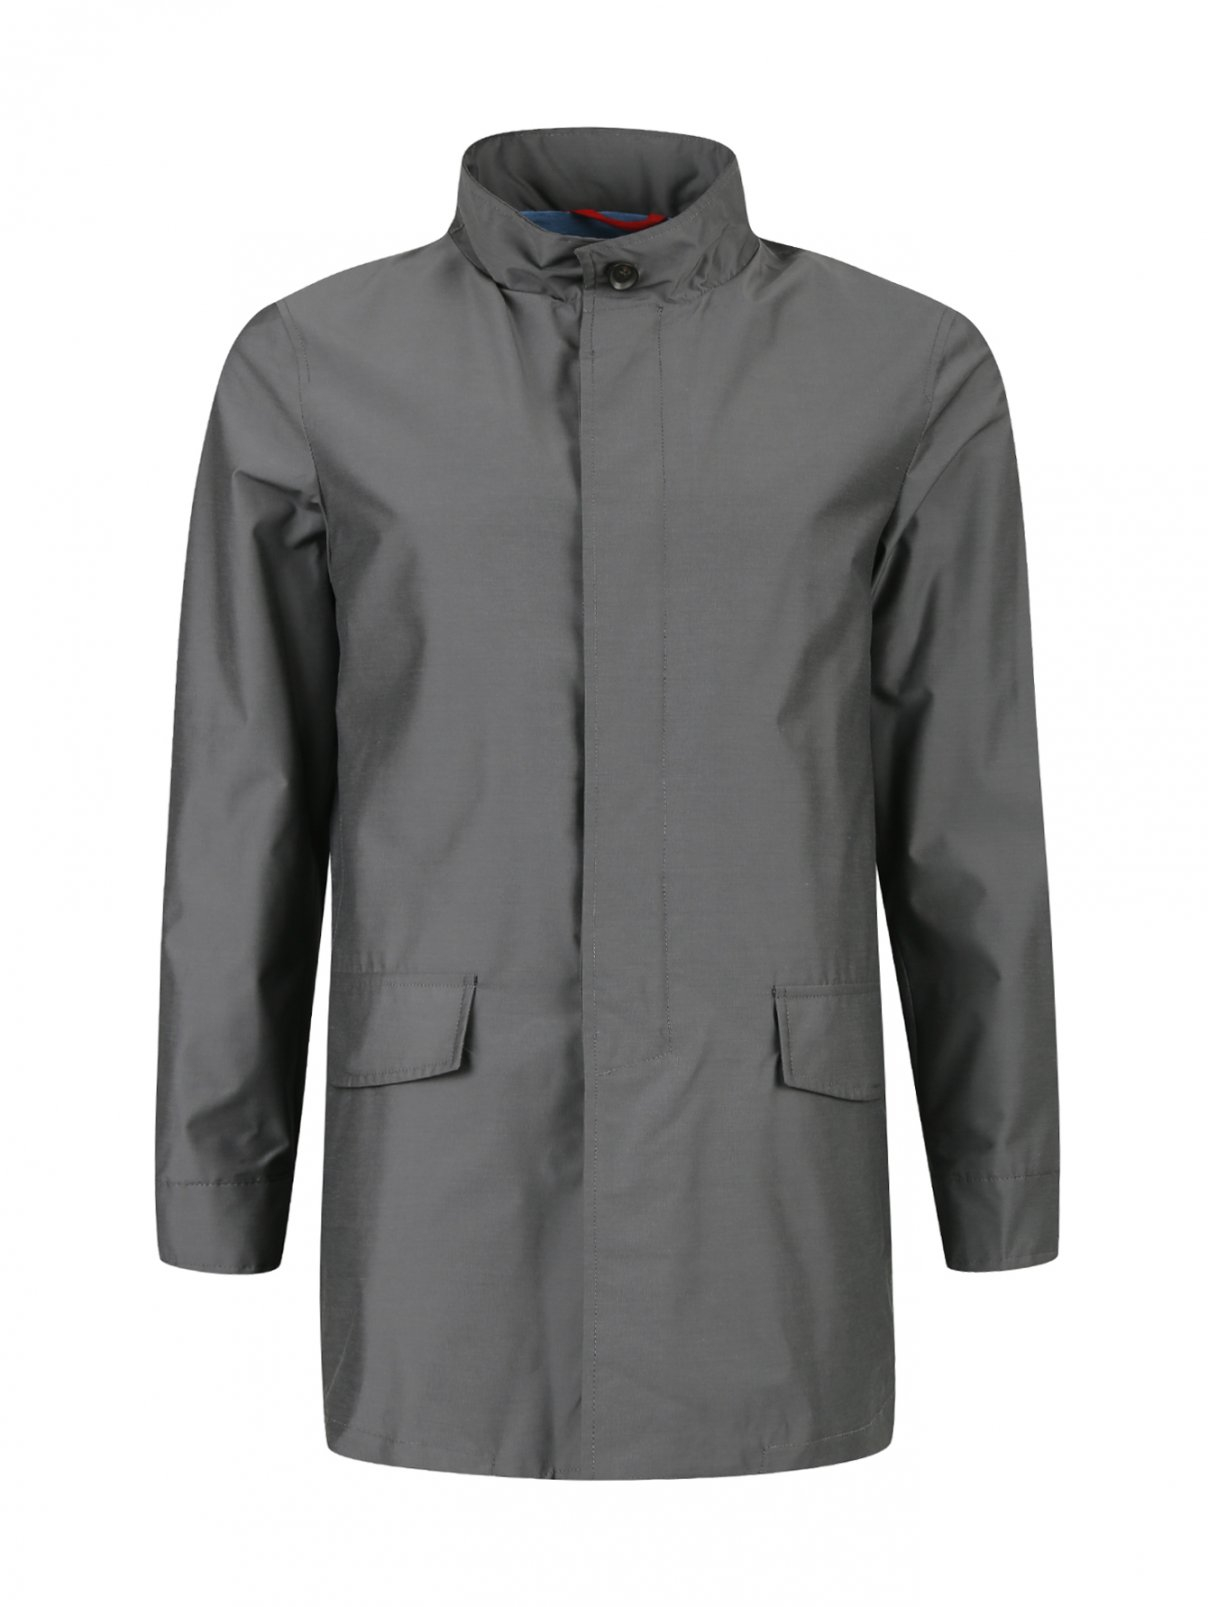 Куртка на молнии Isaia  –  Общий вид  – Цвет:  Серый